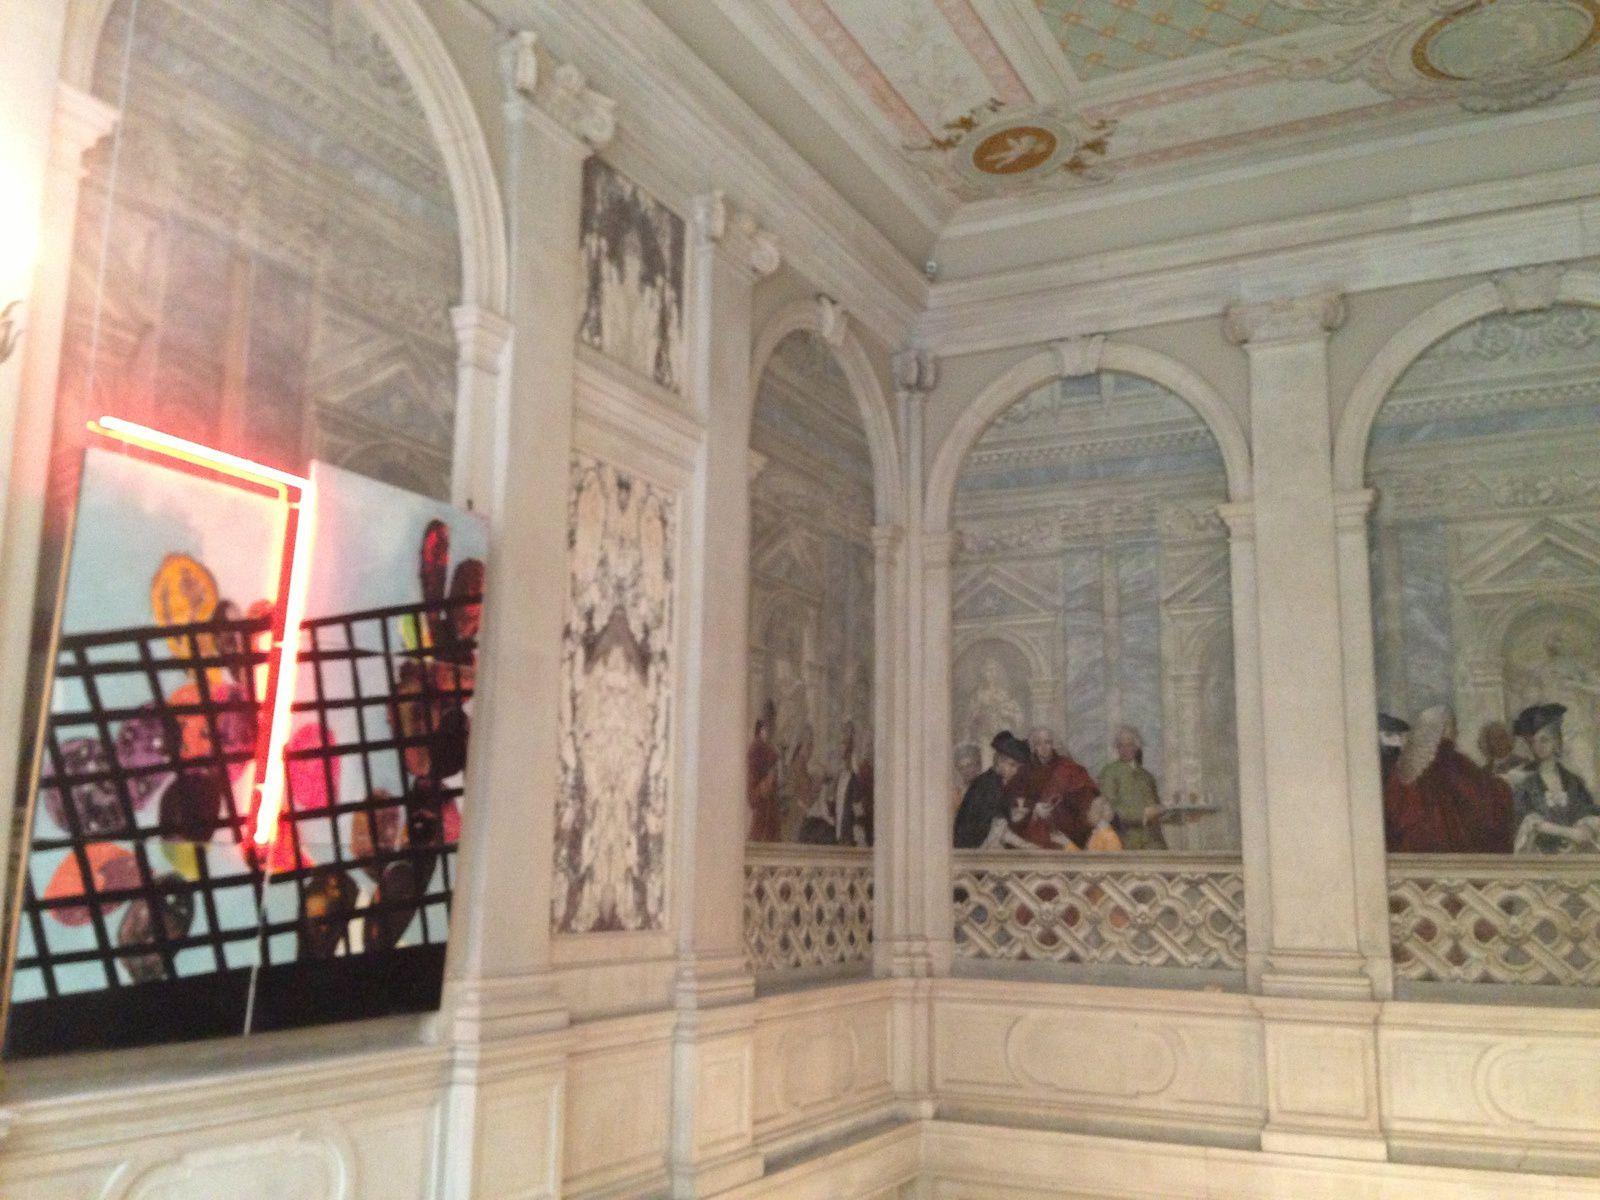 Expo Martial Raysse au Palazzo Grassi à...Venise